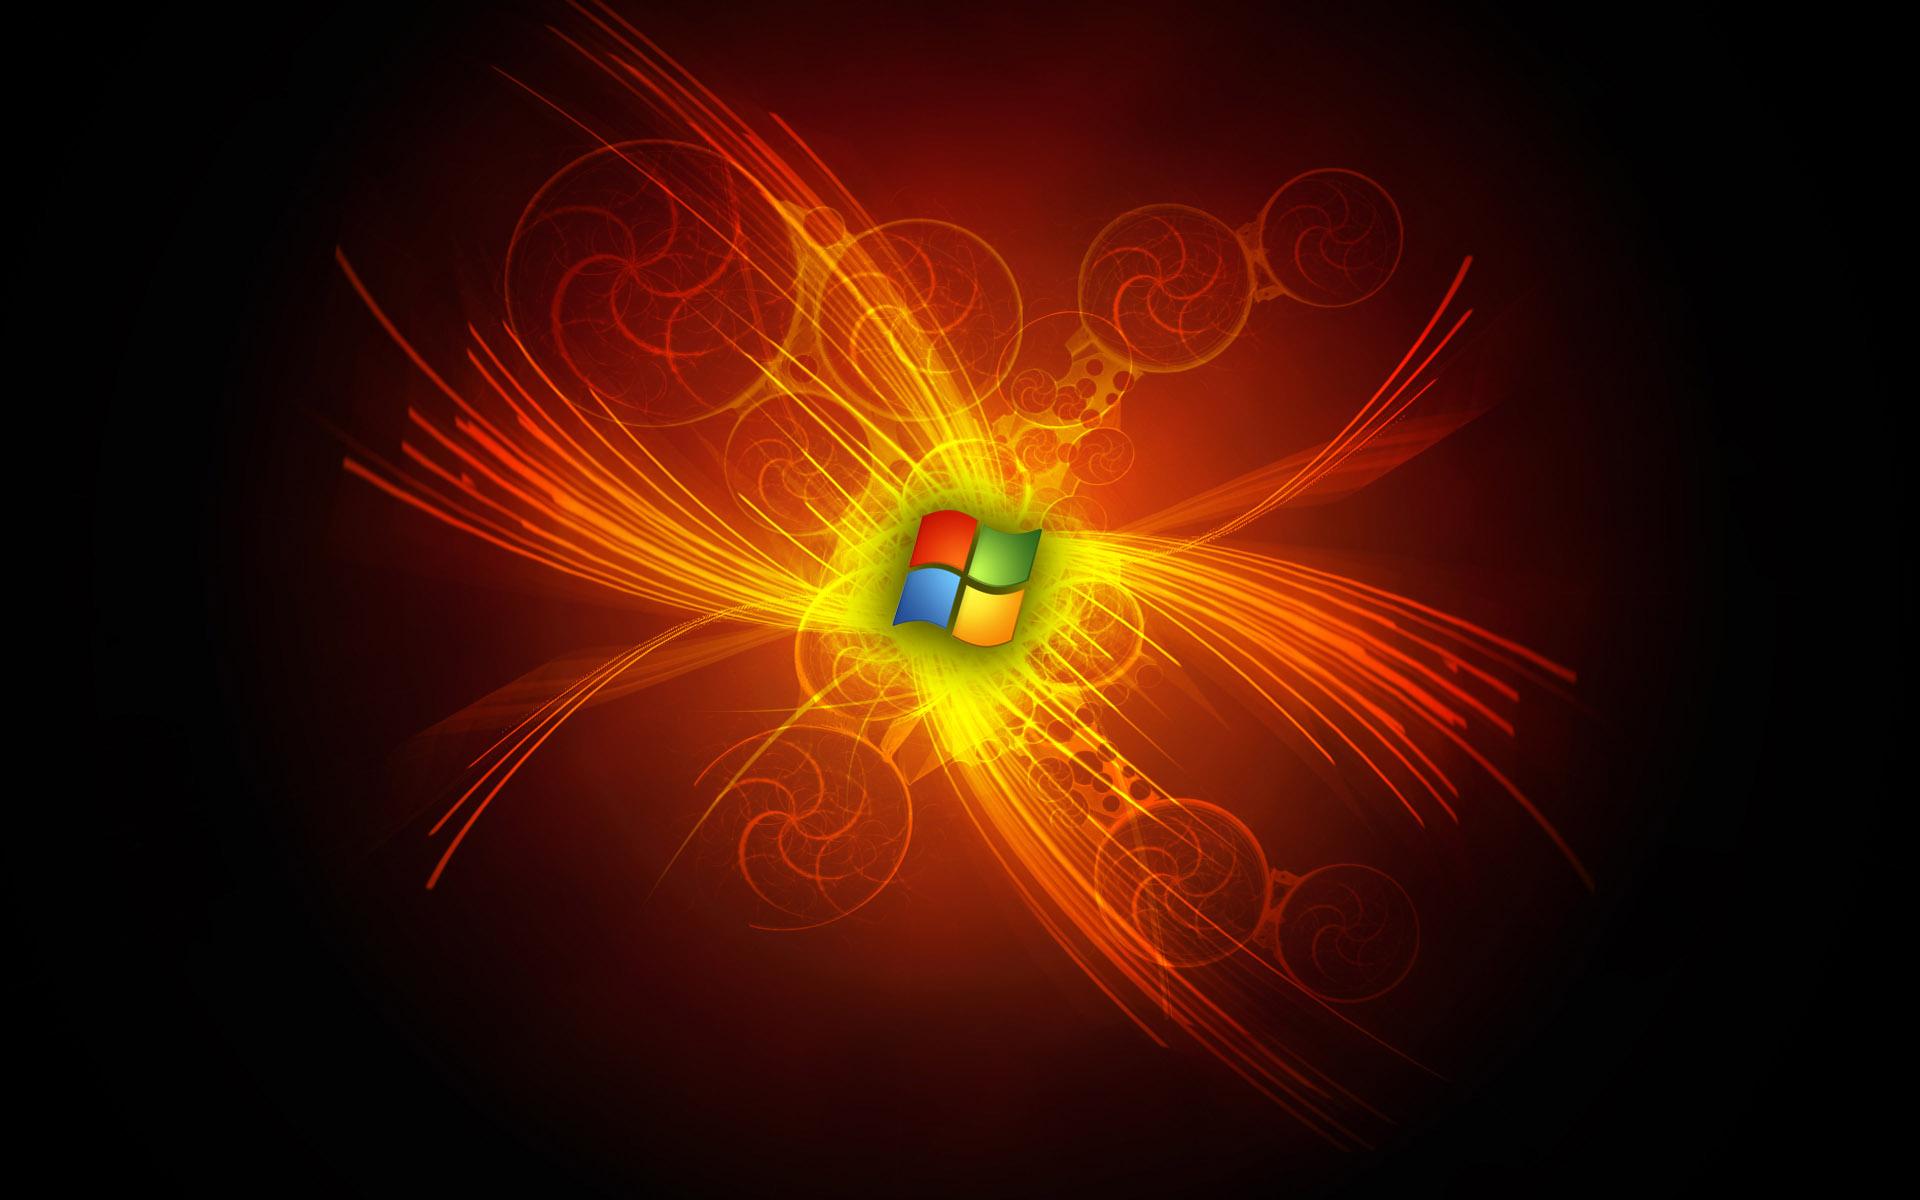 free windows wallpaperz Cool Windows 7 Wallpapers 1920x1200